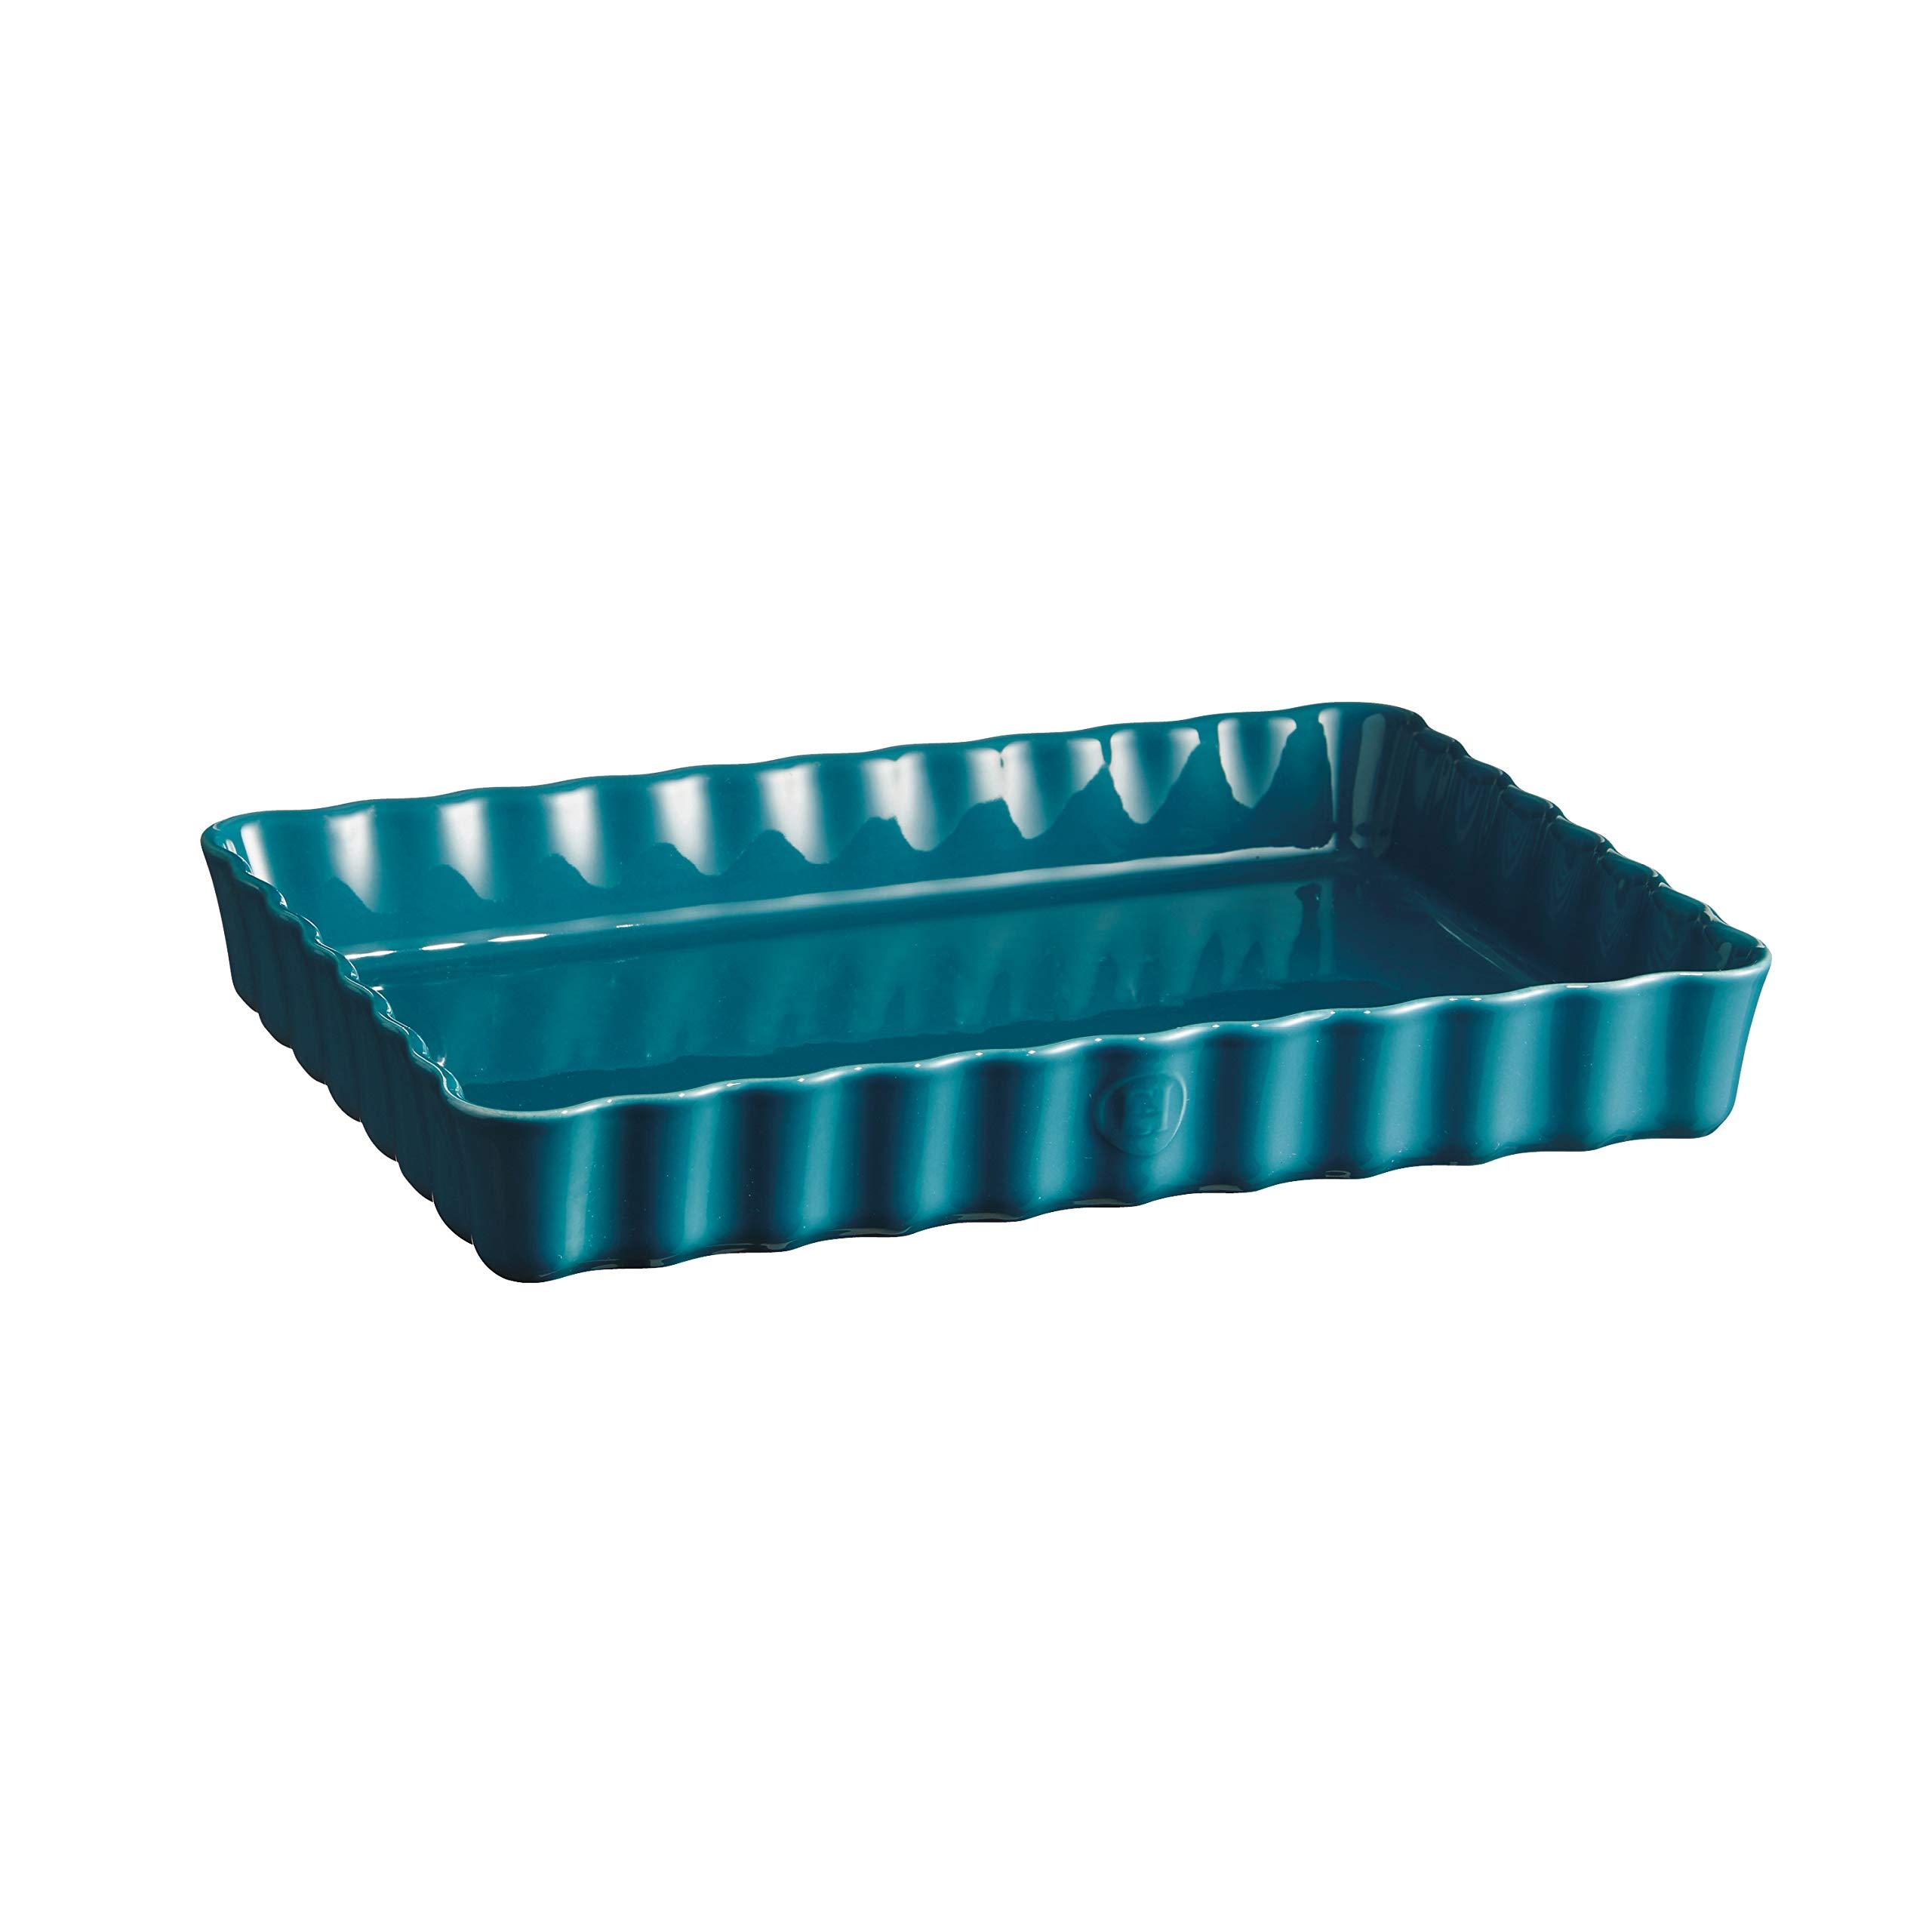 Emile Henry 606038 Large, Mediterranean Blue Rectangular Tart Dish, 2.5 qt,